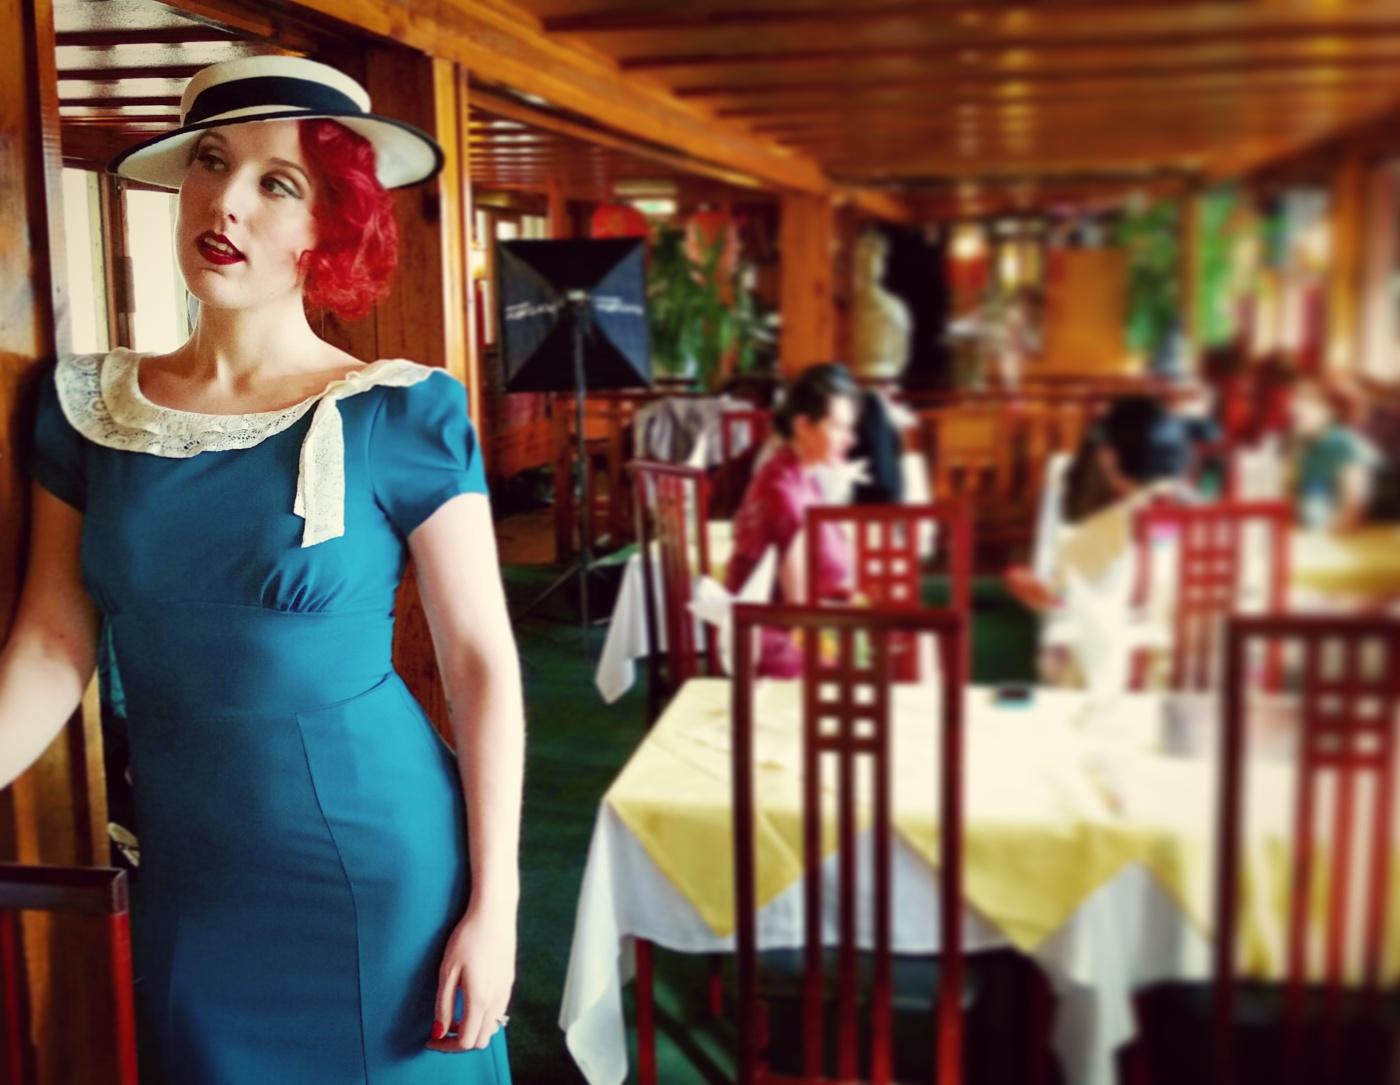 hettiesky   blog   vintage blog   vintage fashion   blogger   pin up   pinup   beauty   history   style   vintage clothing   vintage style   beauty blog   glamour   beauty tips